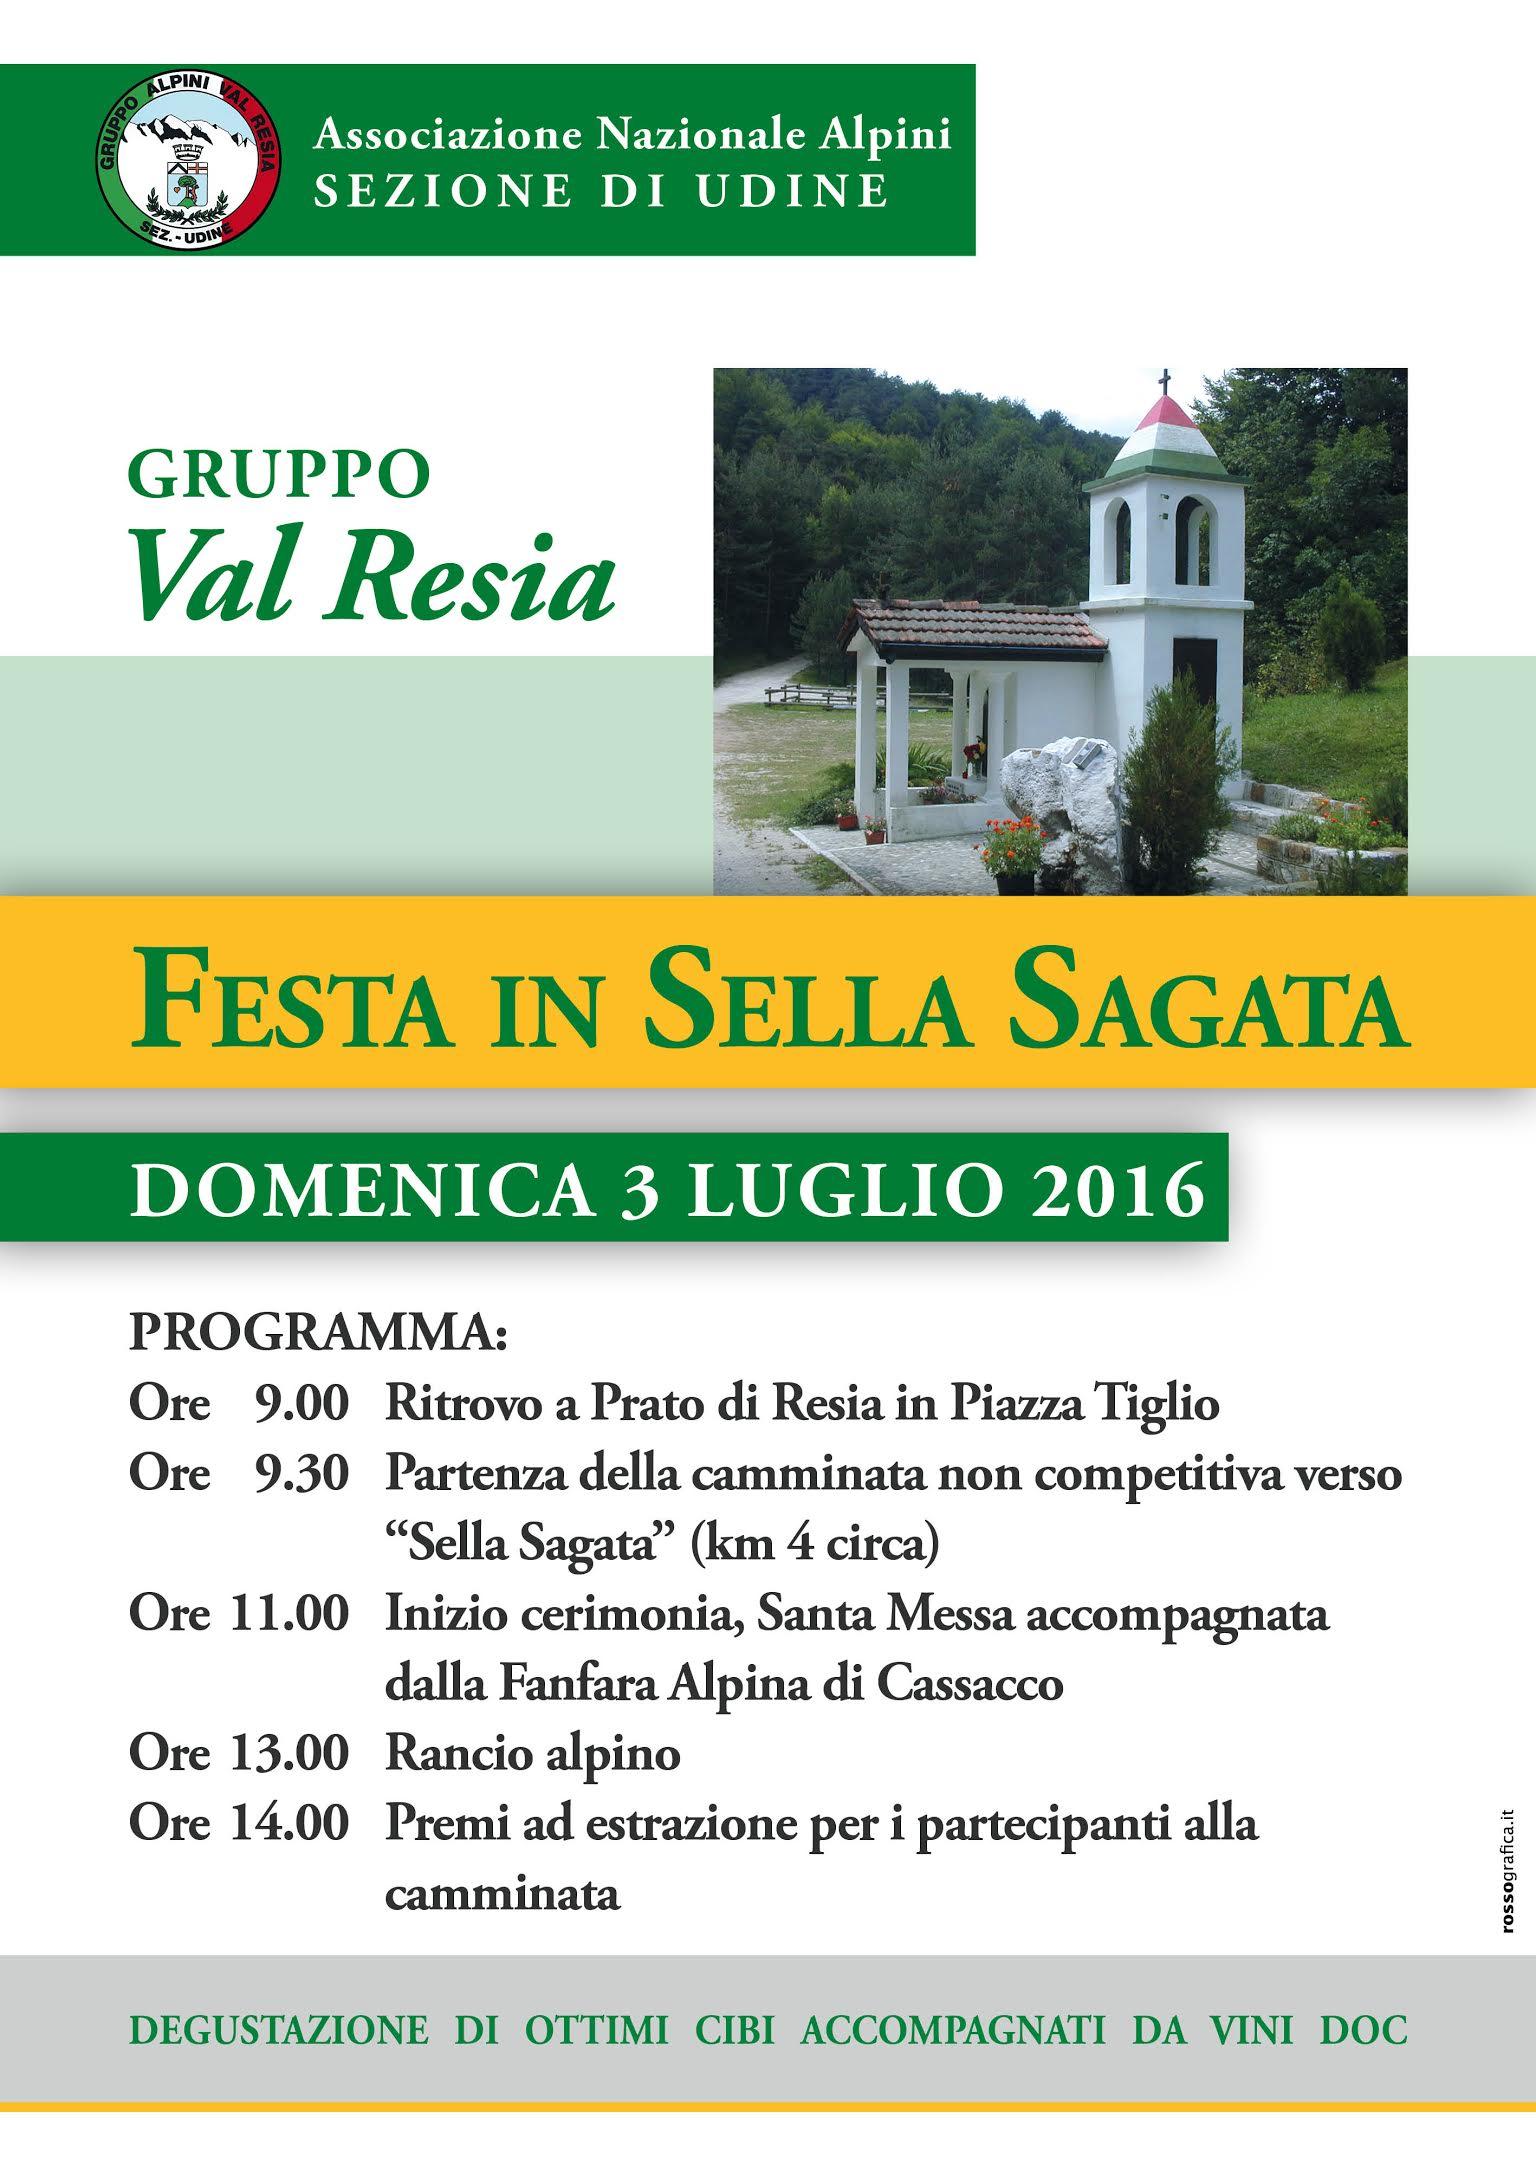 Festa in Sella Sagata 2016